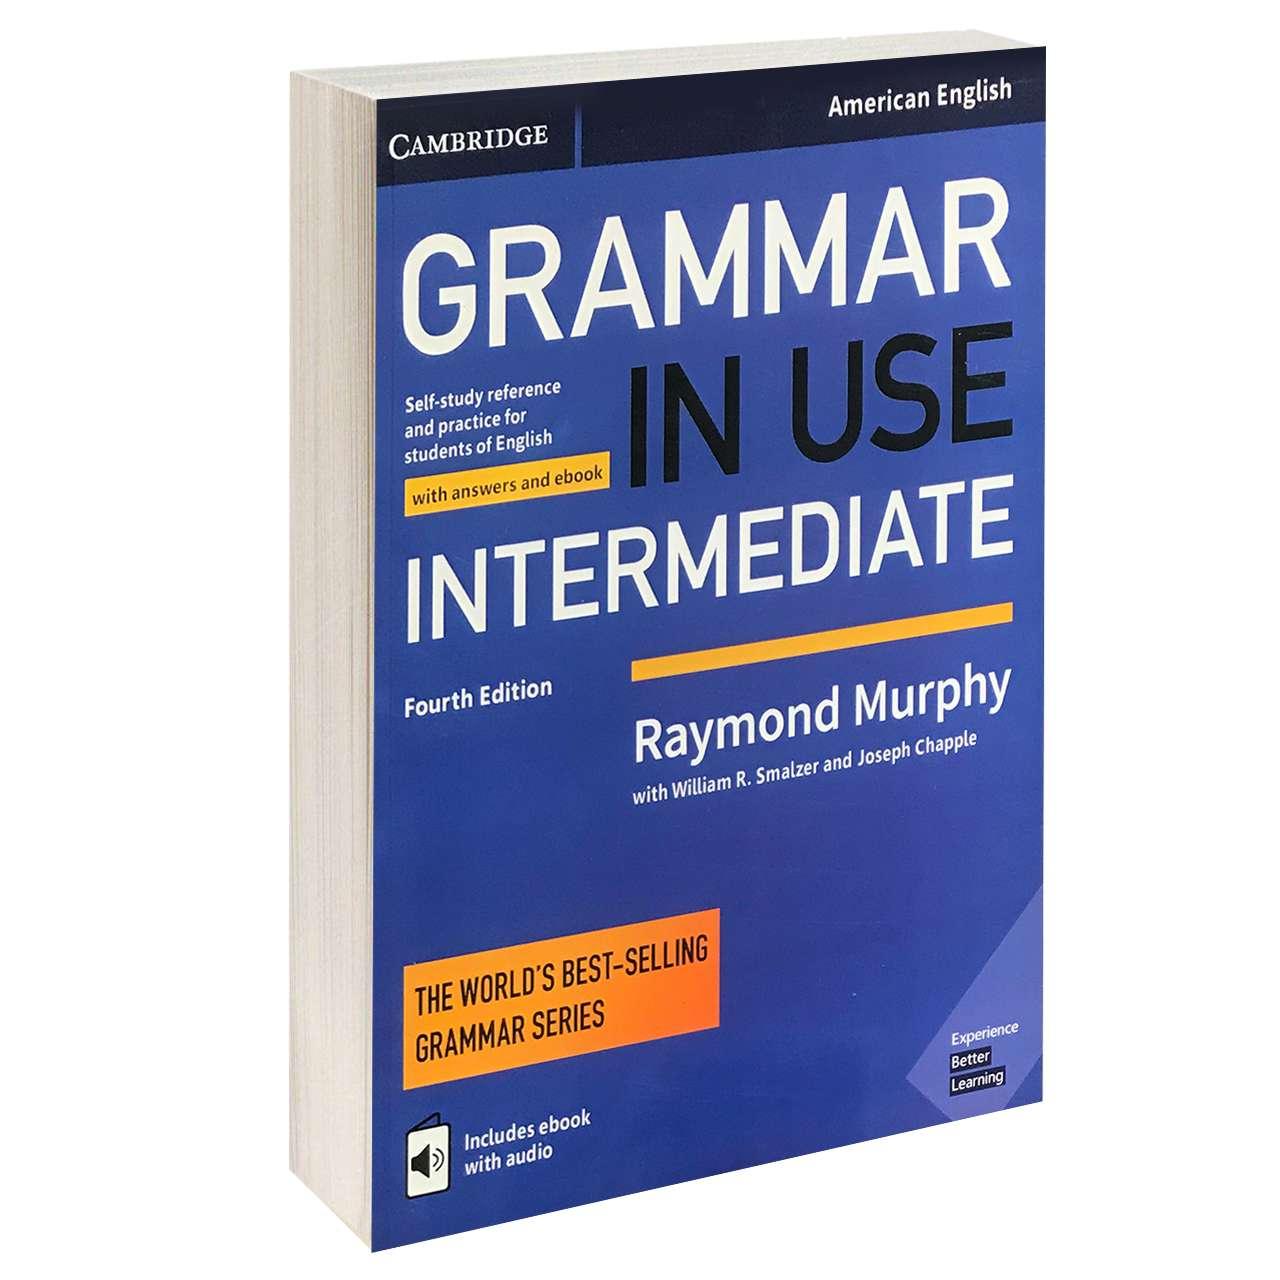 خرید                      کتاب GRAMMER IN USE INTERMEDIATE اثر جمعی از نویسندگان انتشارات CAMBRIDGE